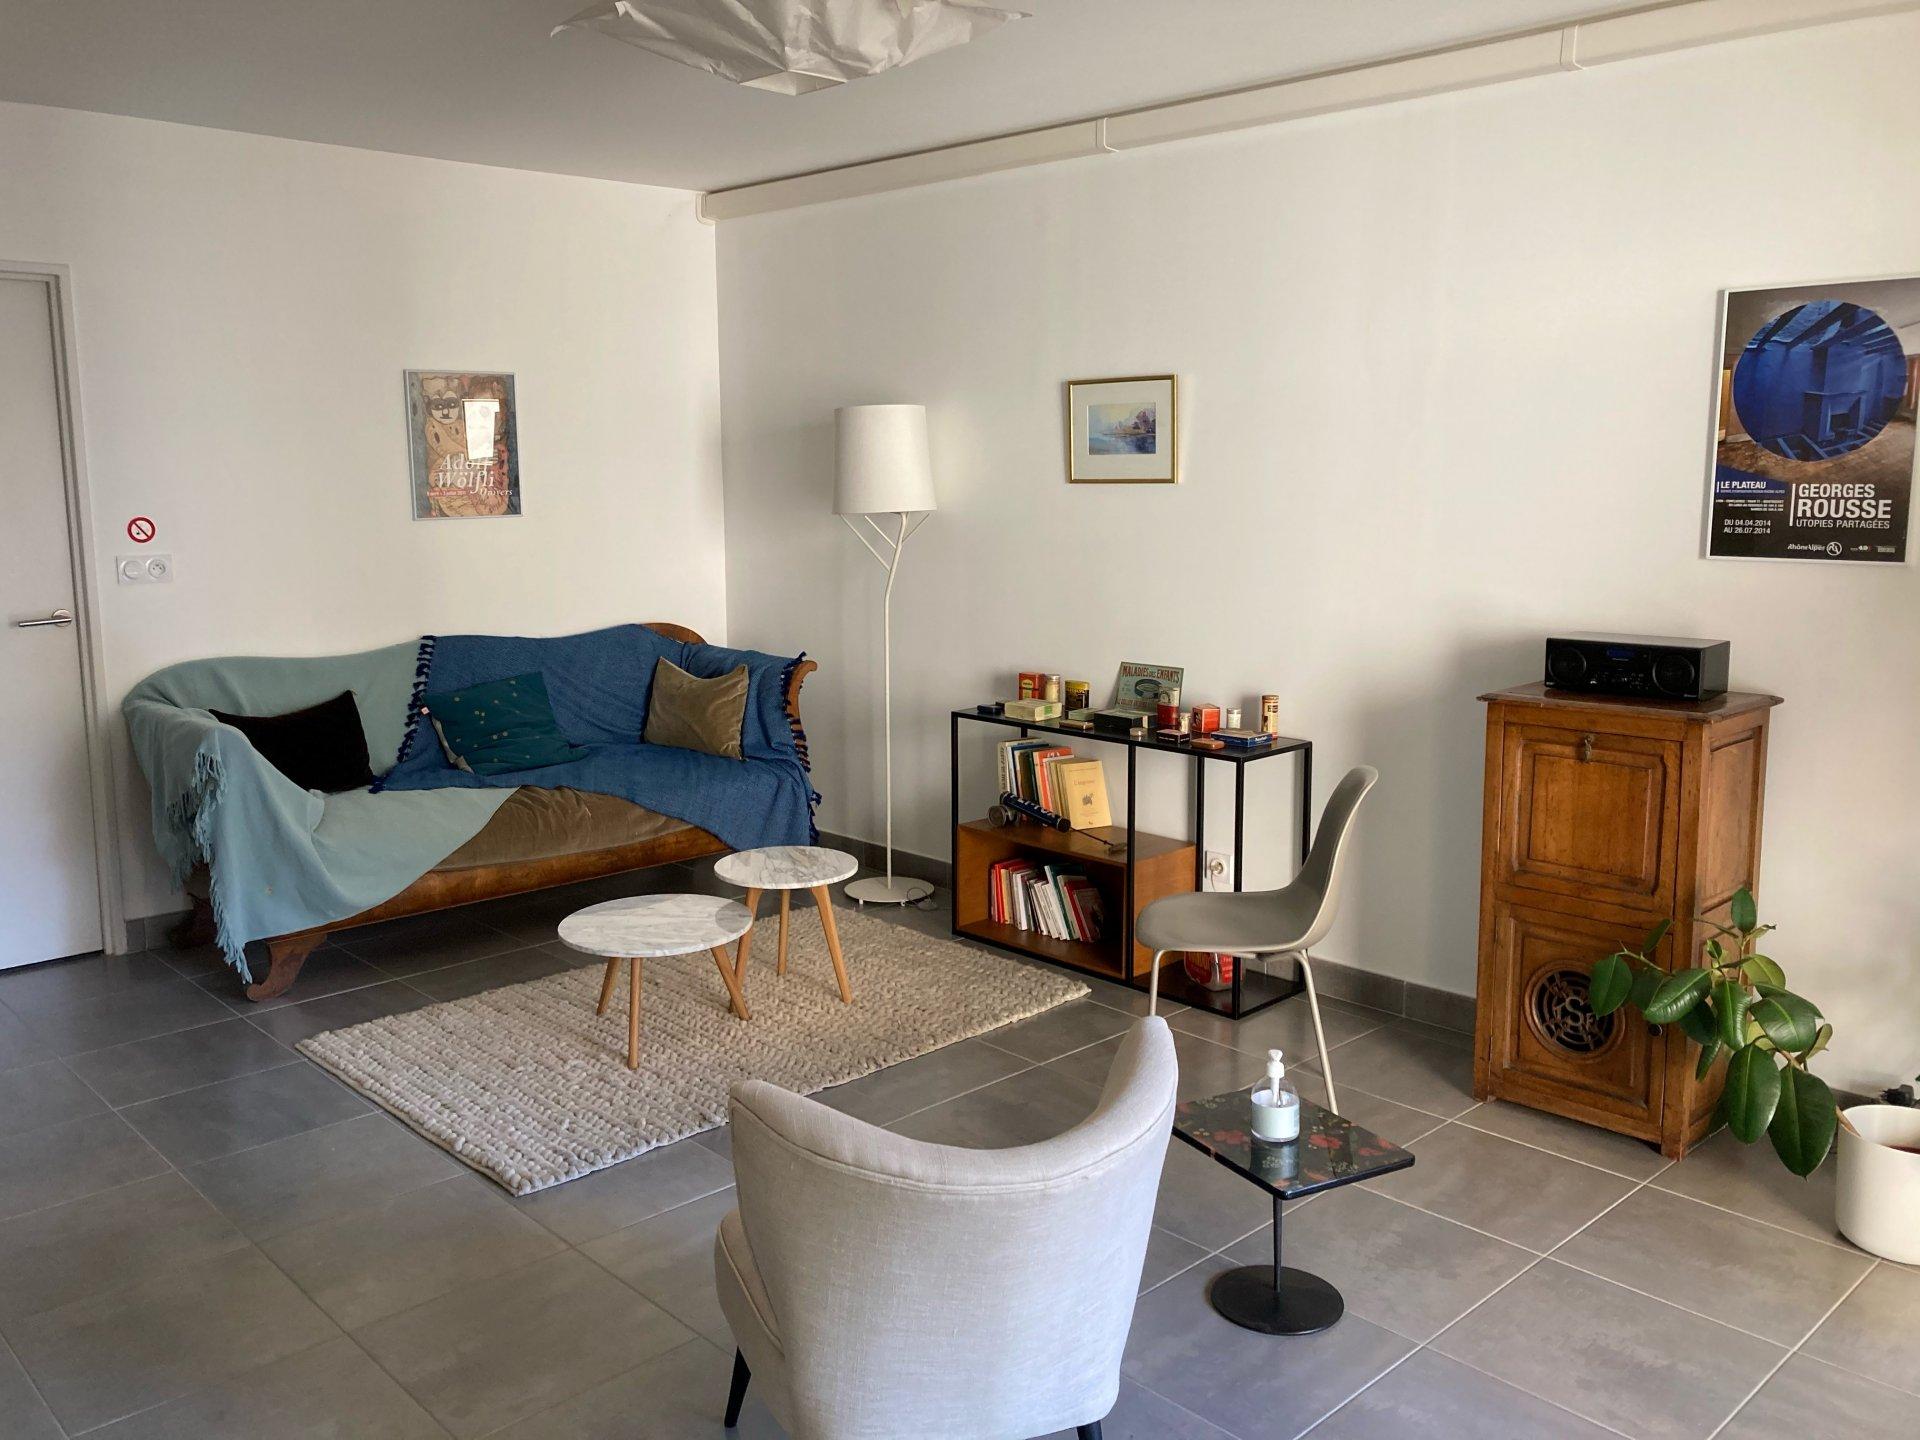 Sale Apartment - Tassin-la-Demi-Lune Centre ville